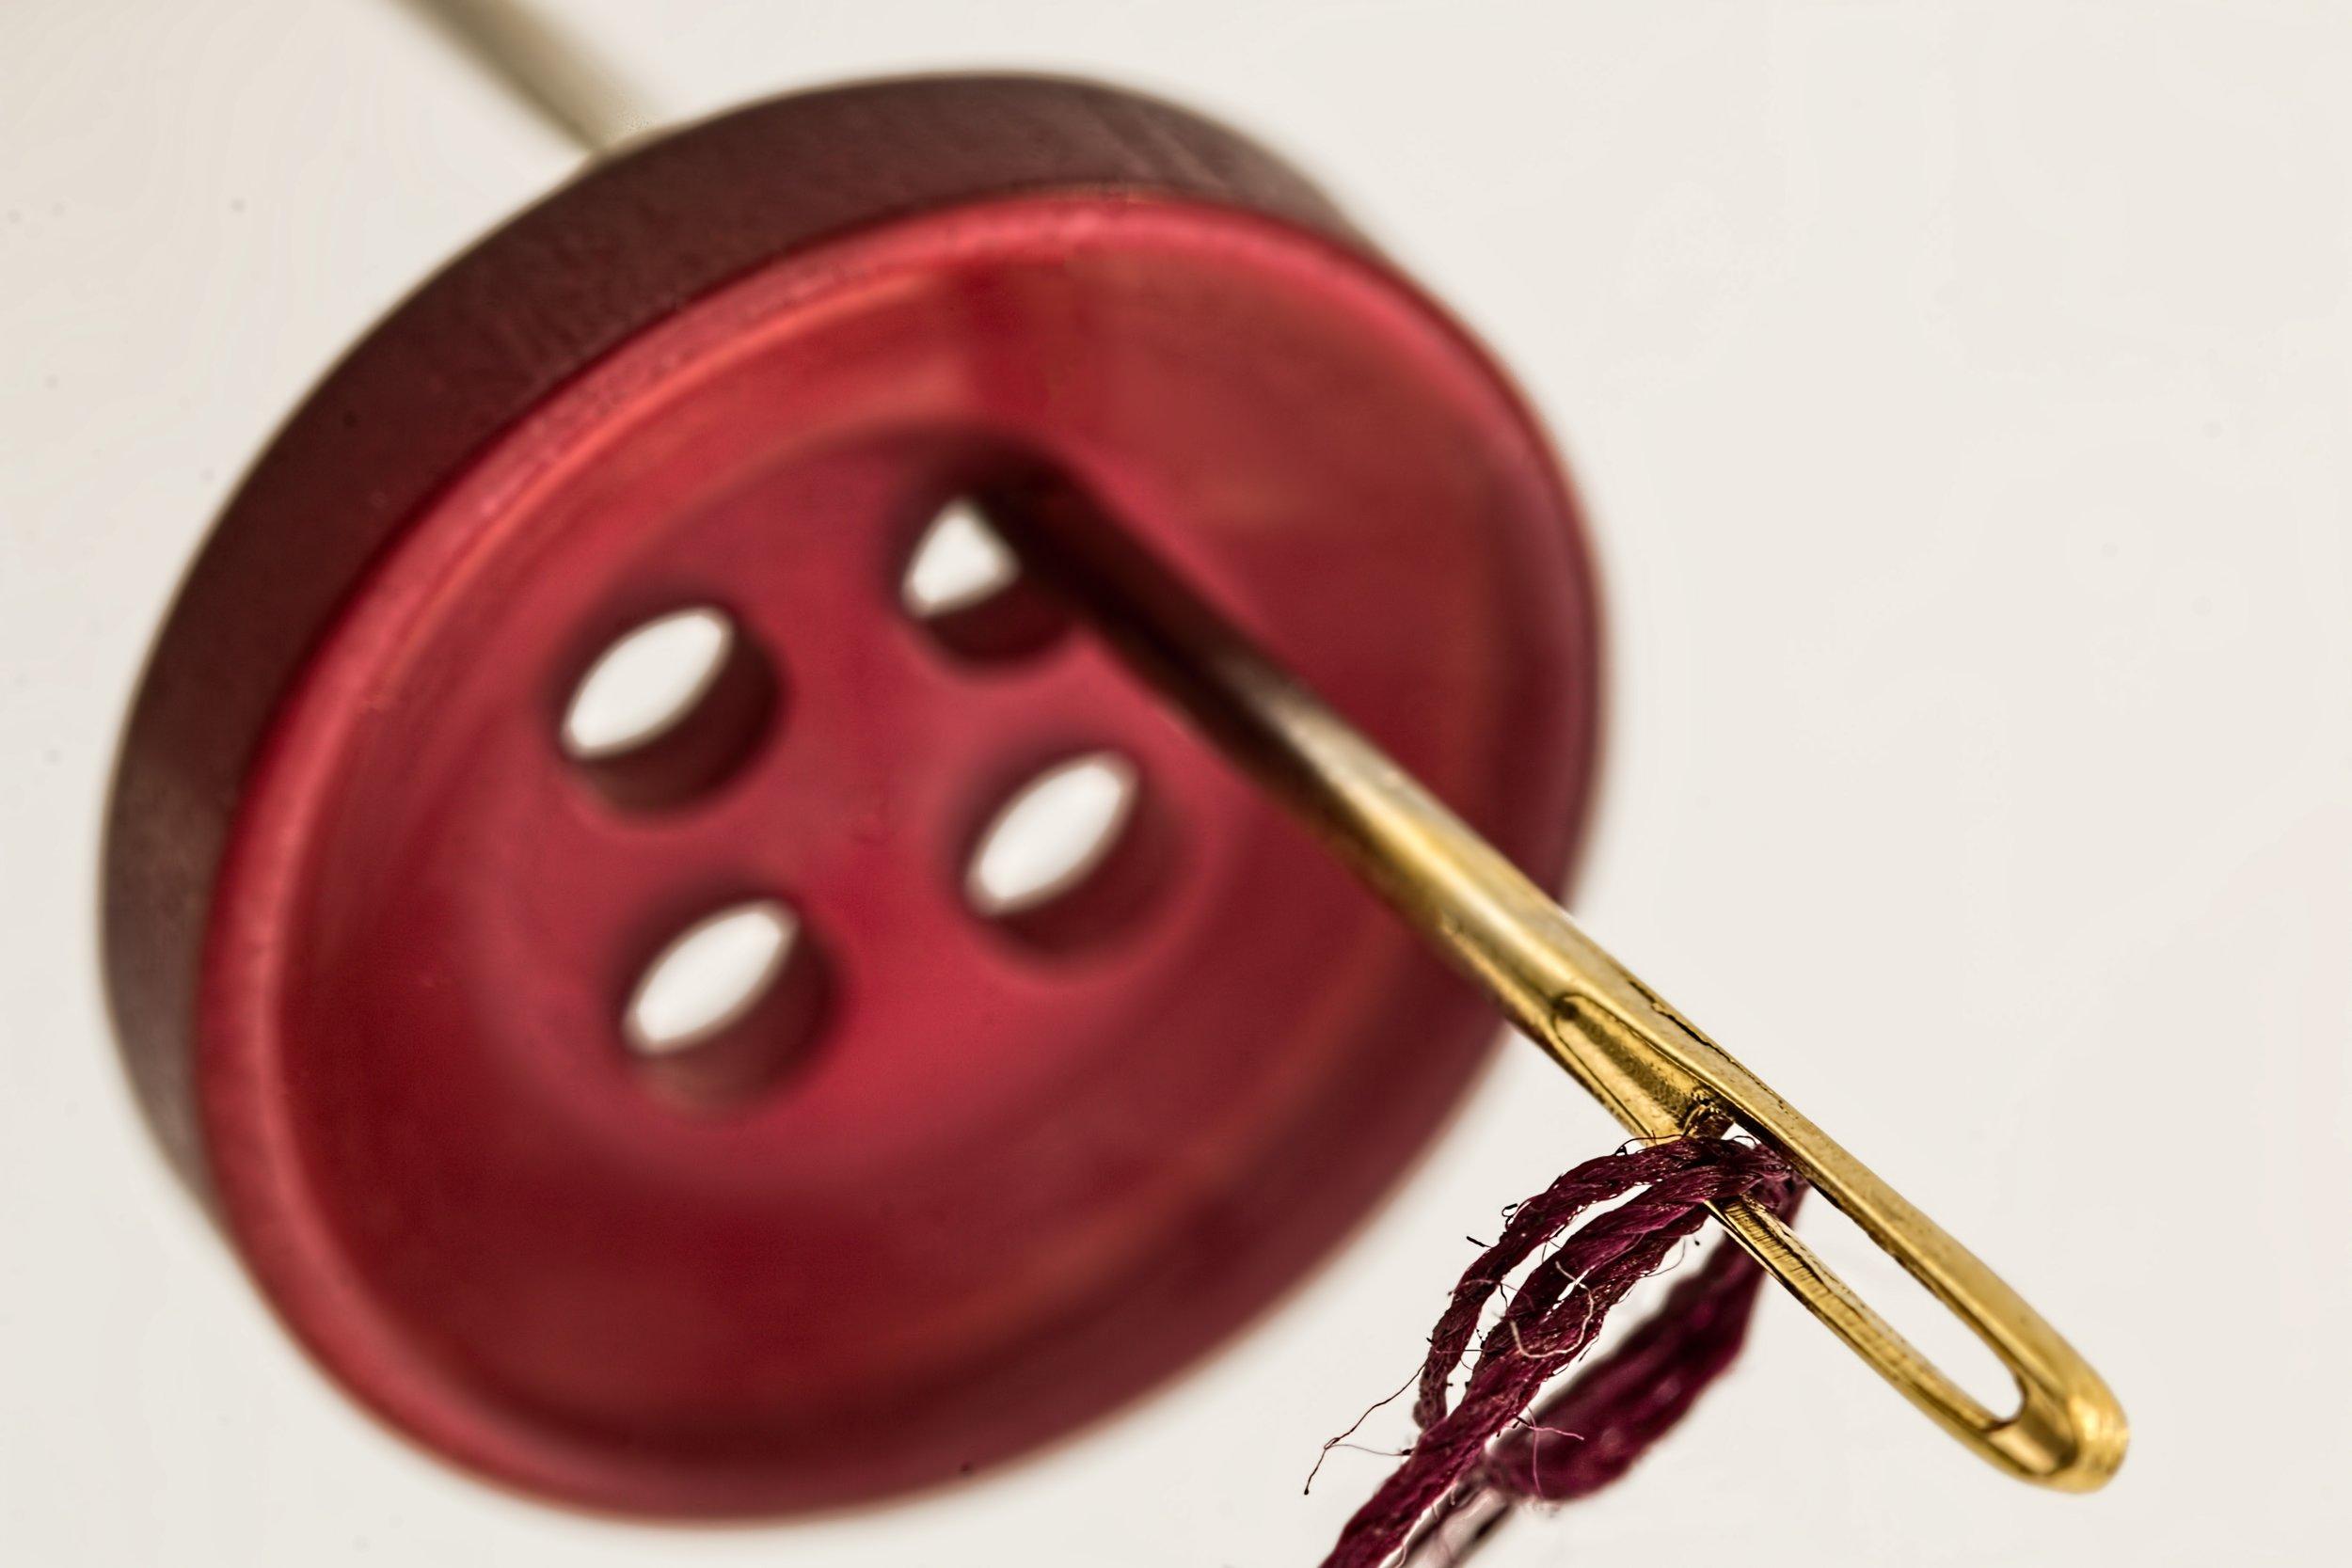 sewing-needle-thread-mend-eye-of-needle-39548.jpeg